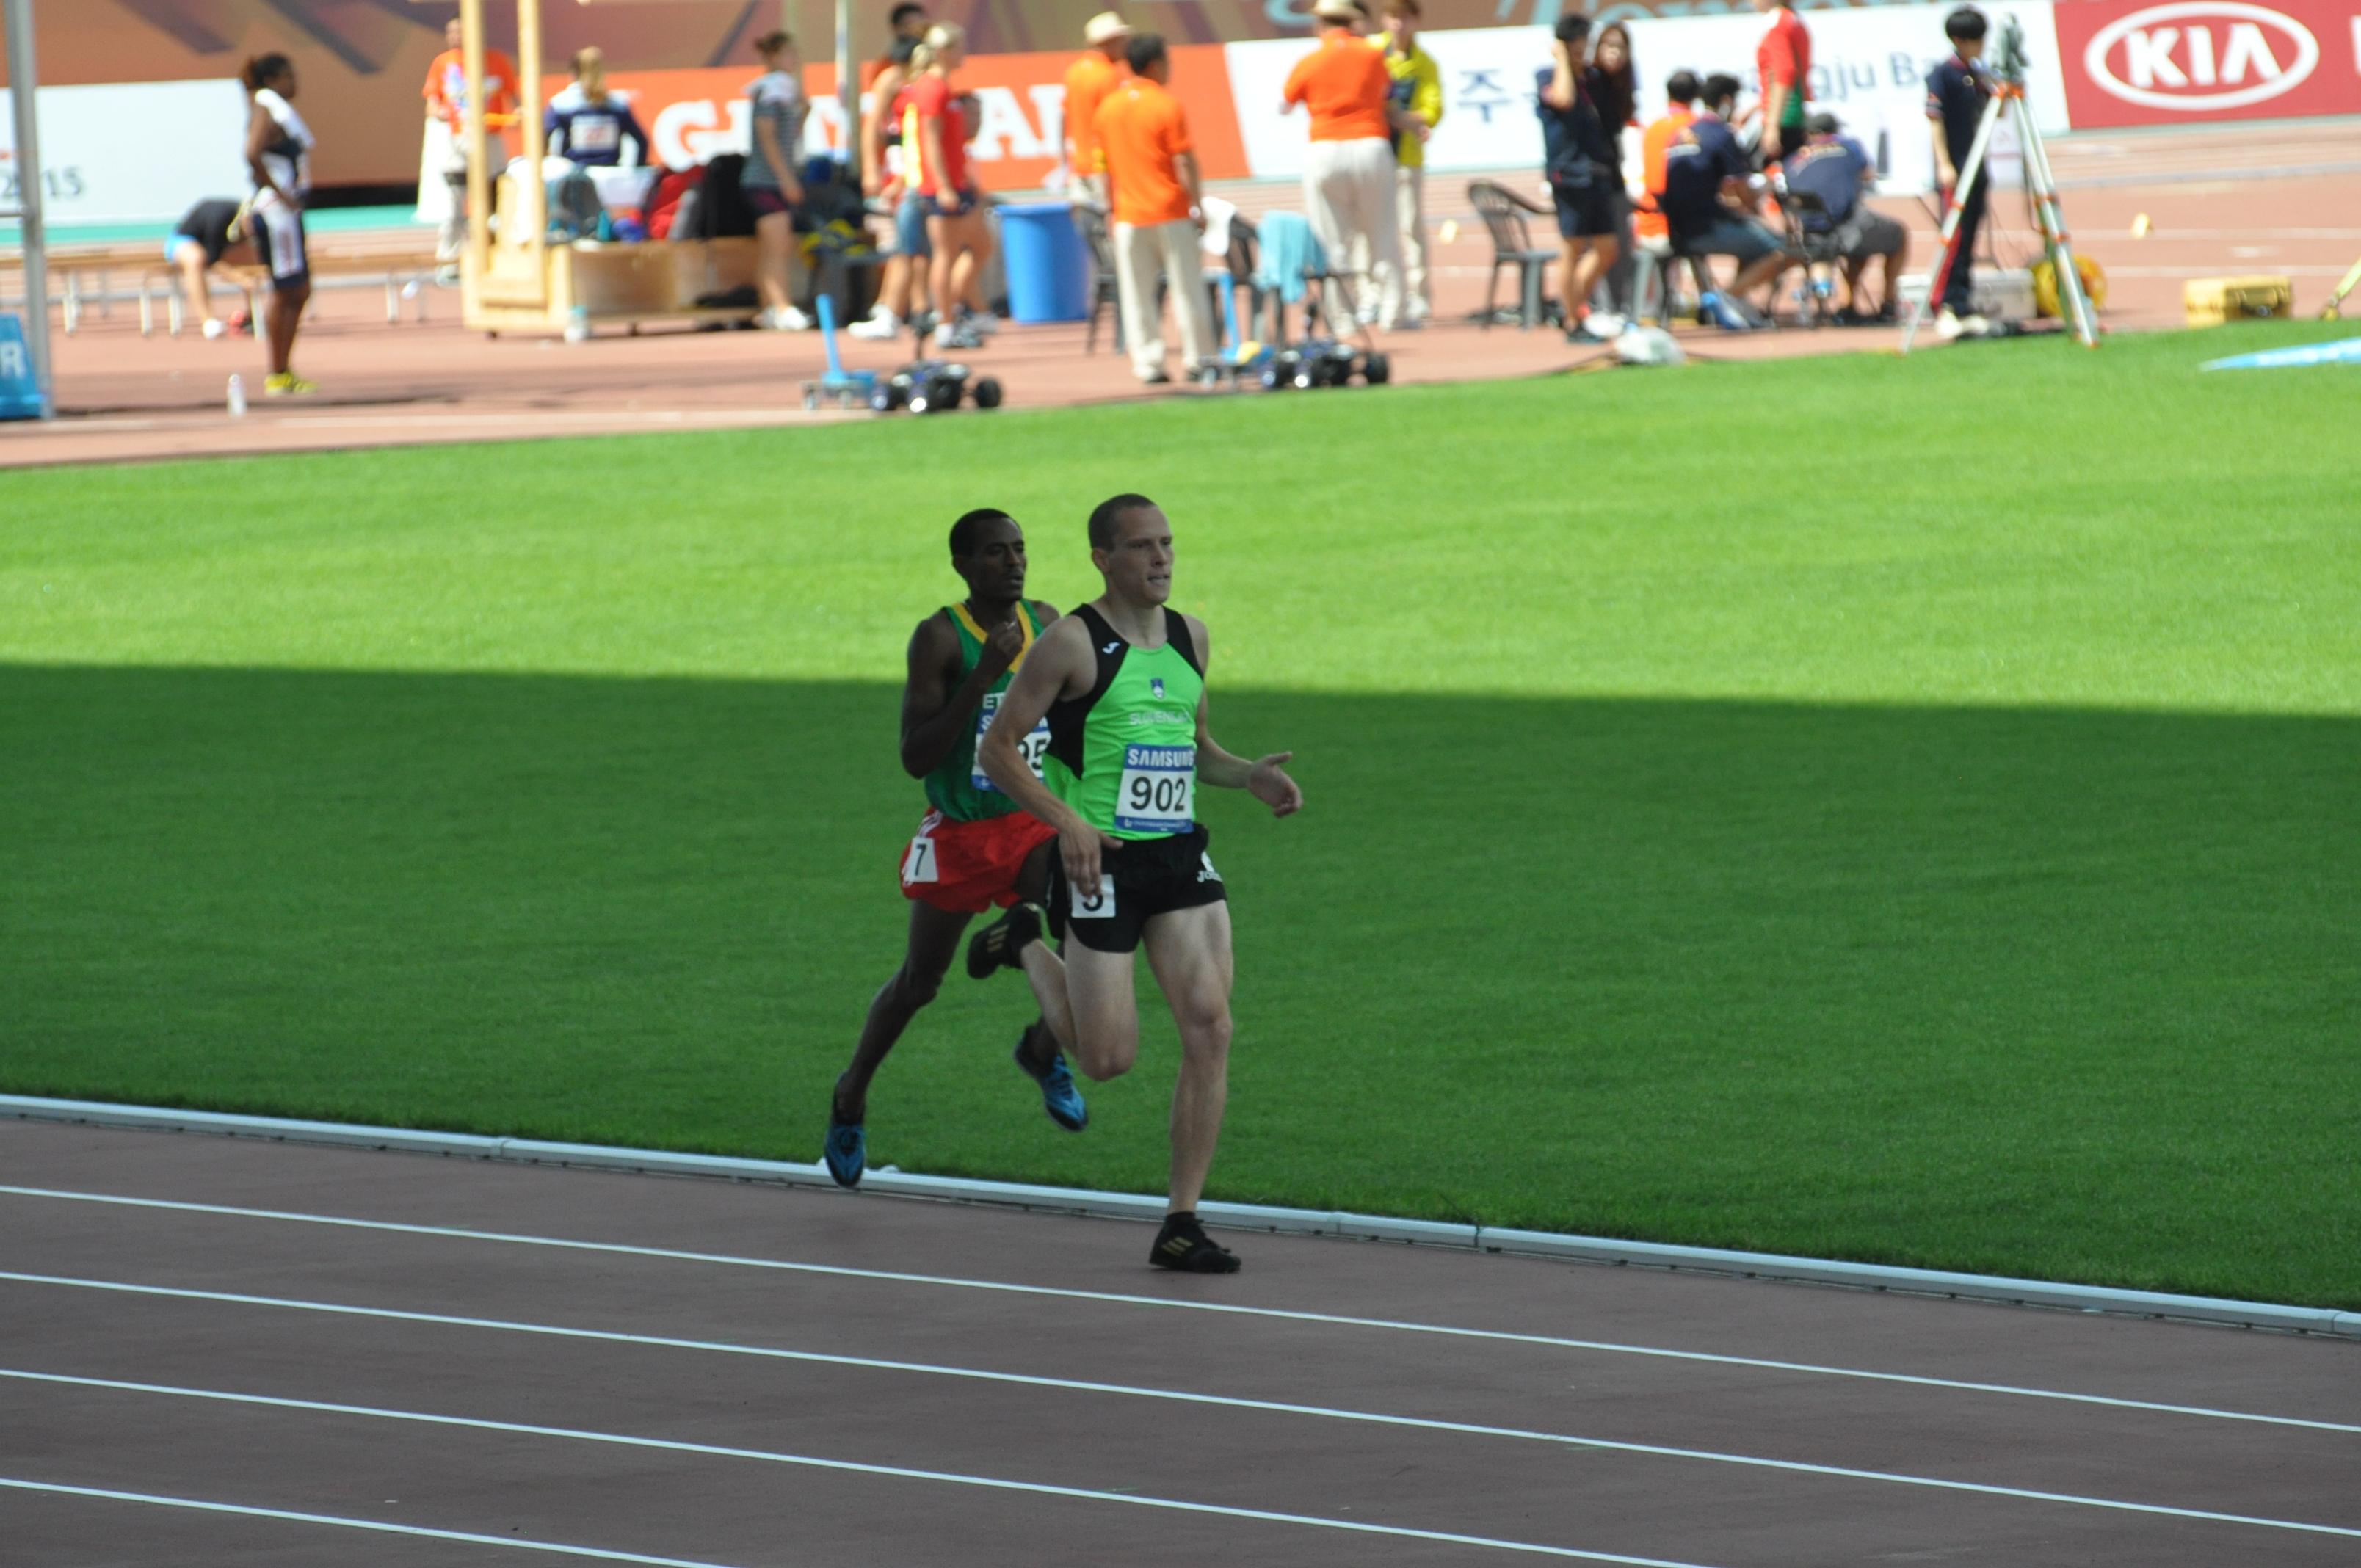 In 2015 I ran 800 metres at the summer Universiade in Gwangju.